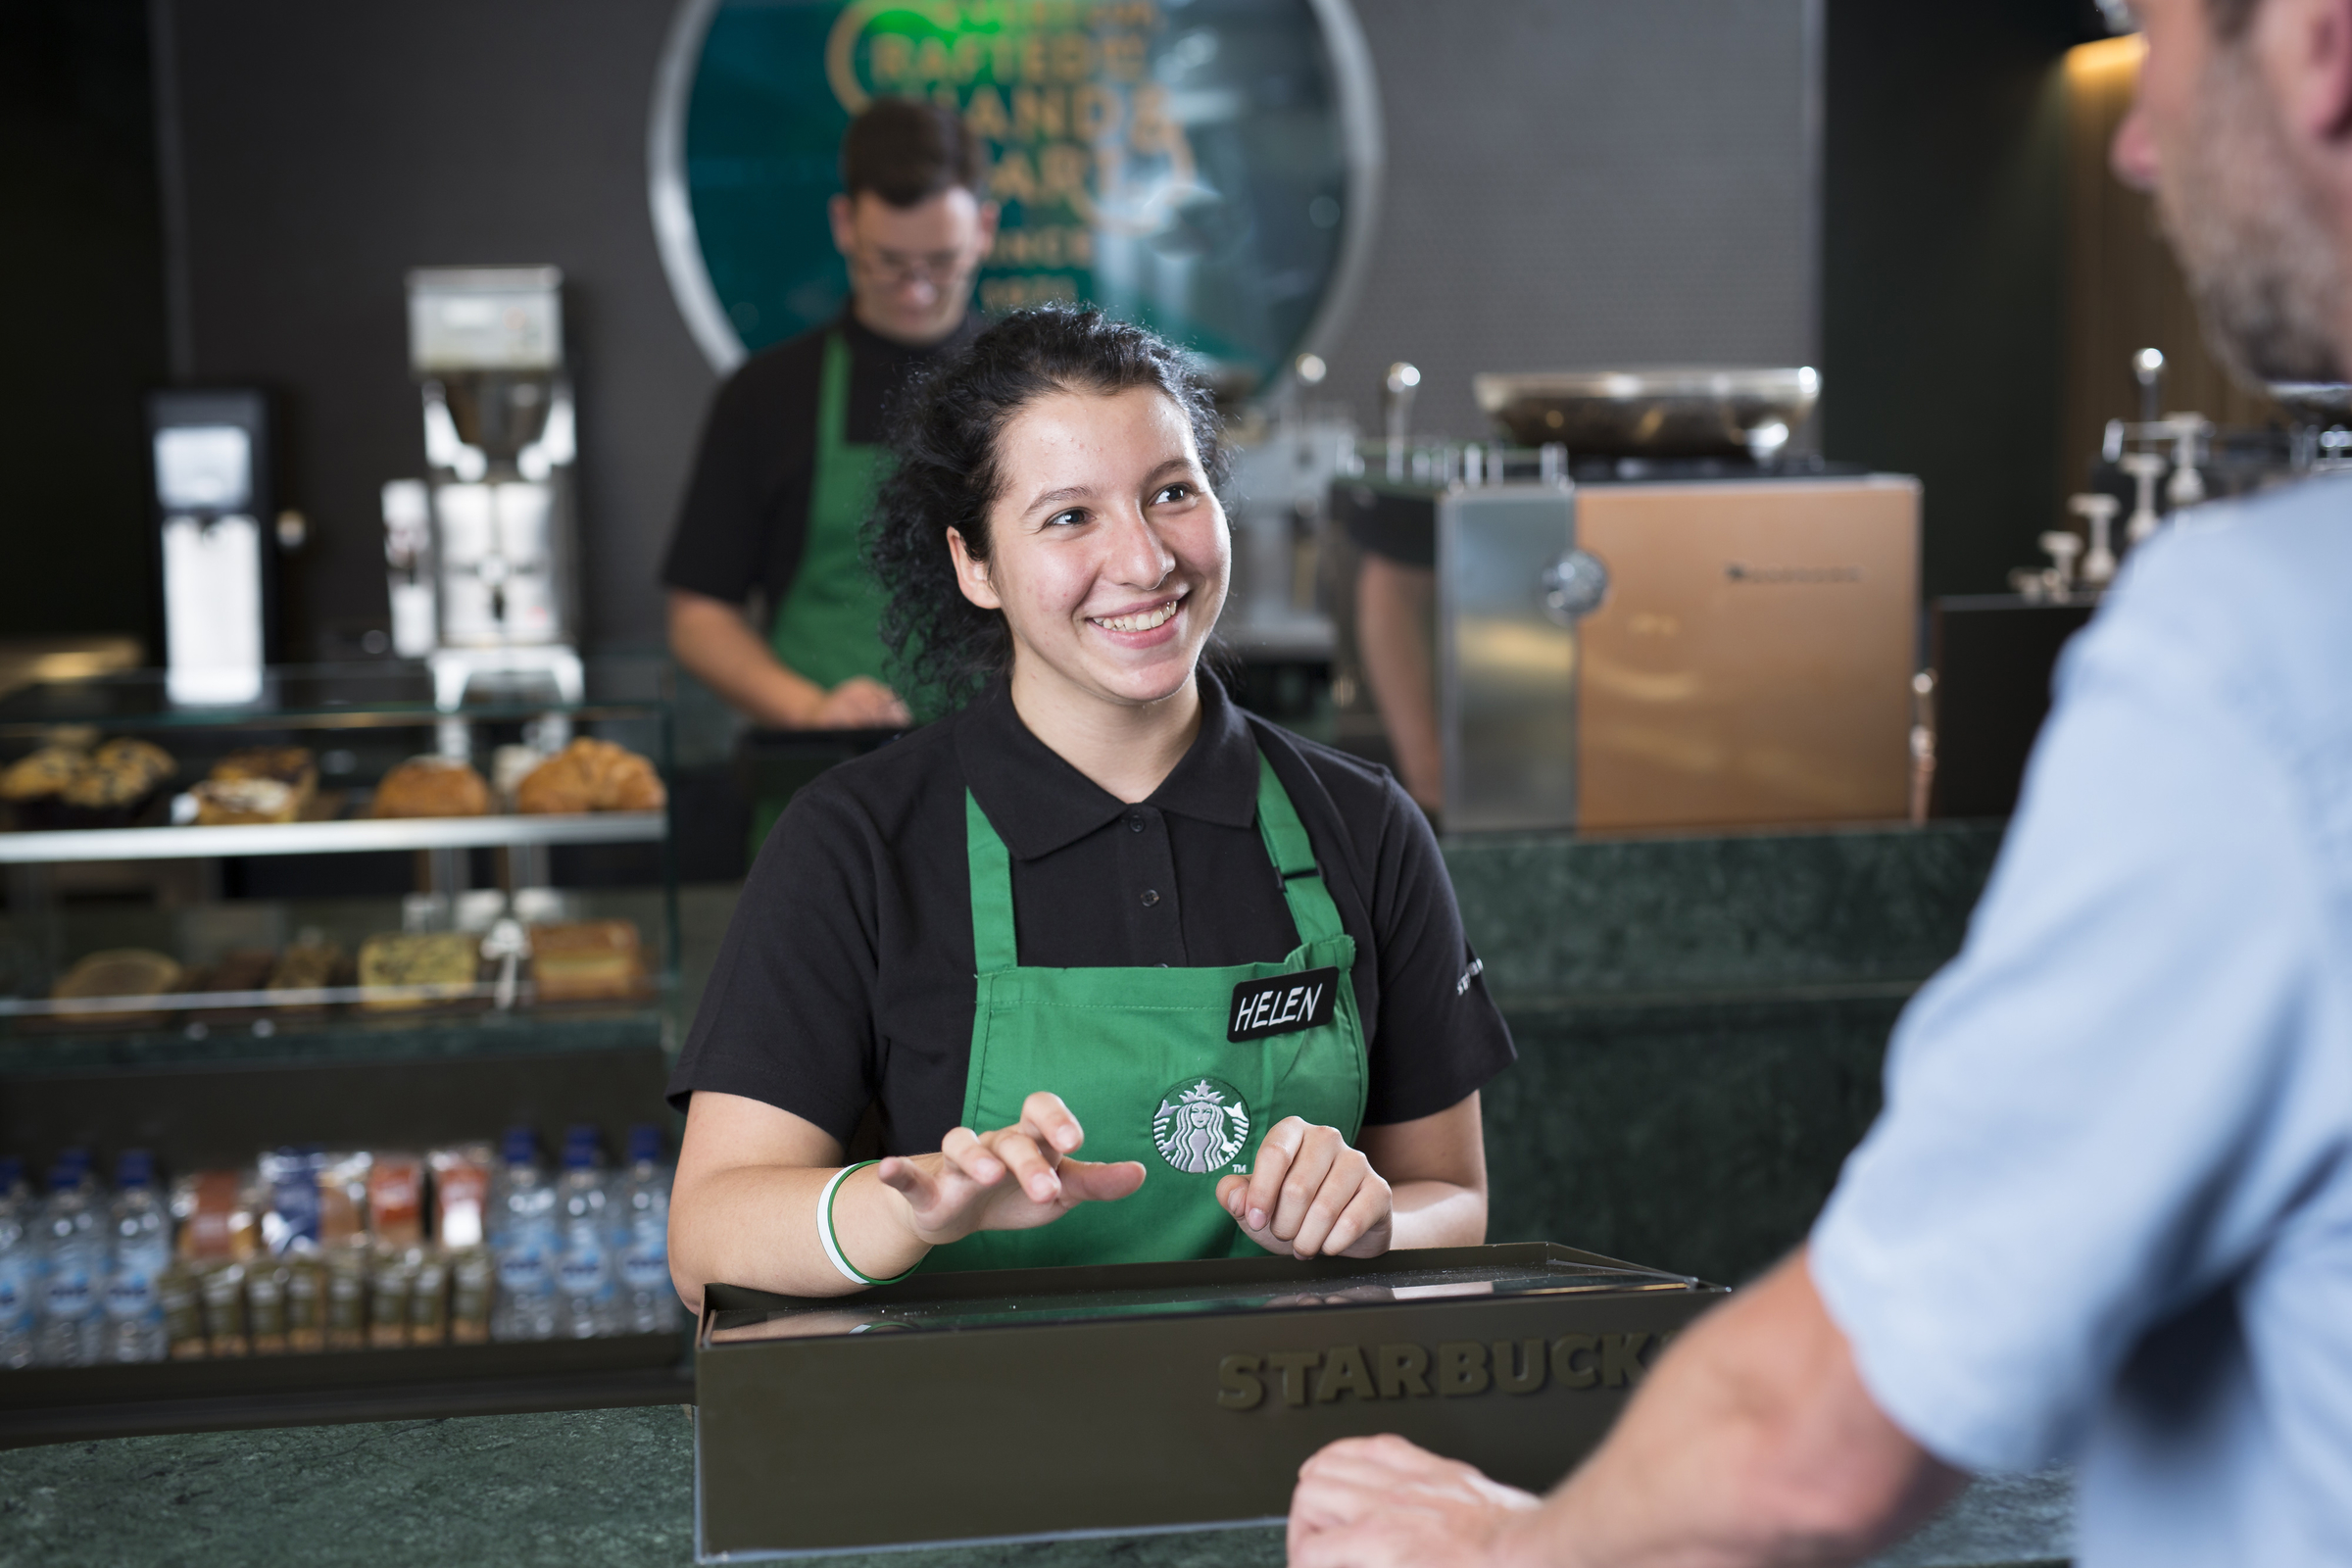 Starbucks_180716-2